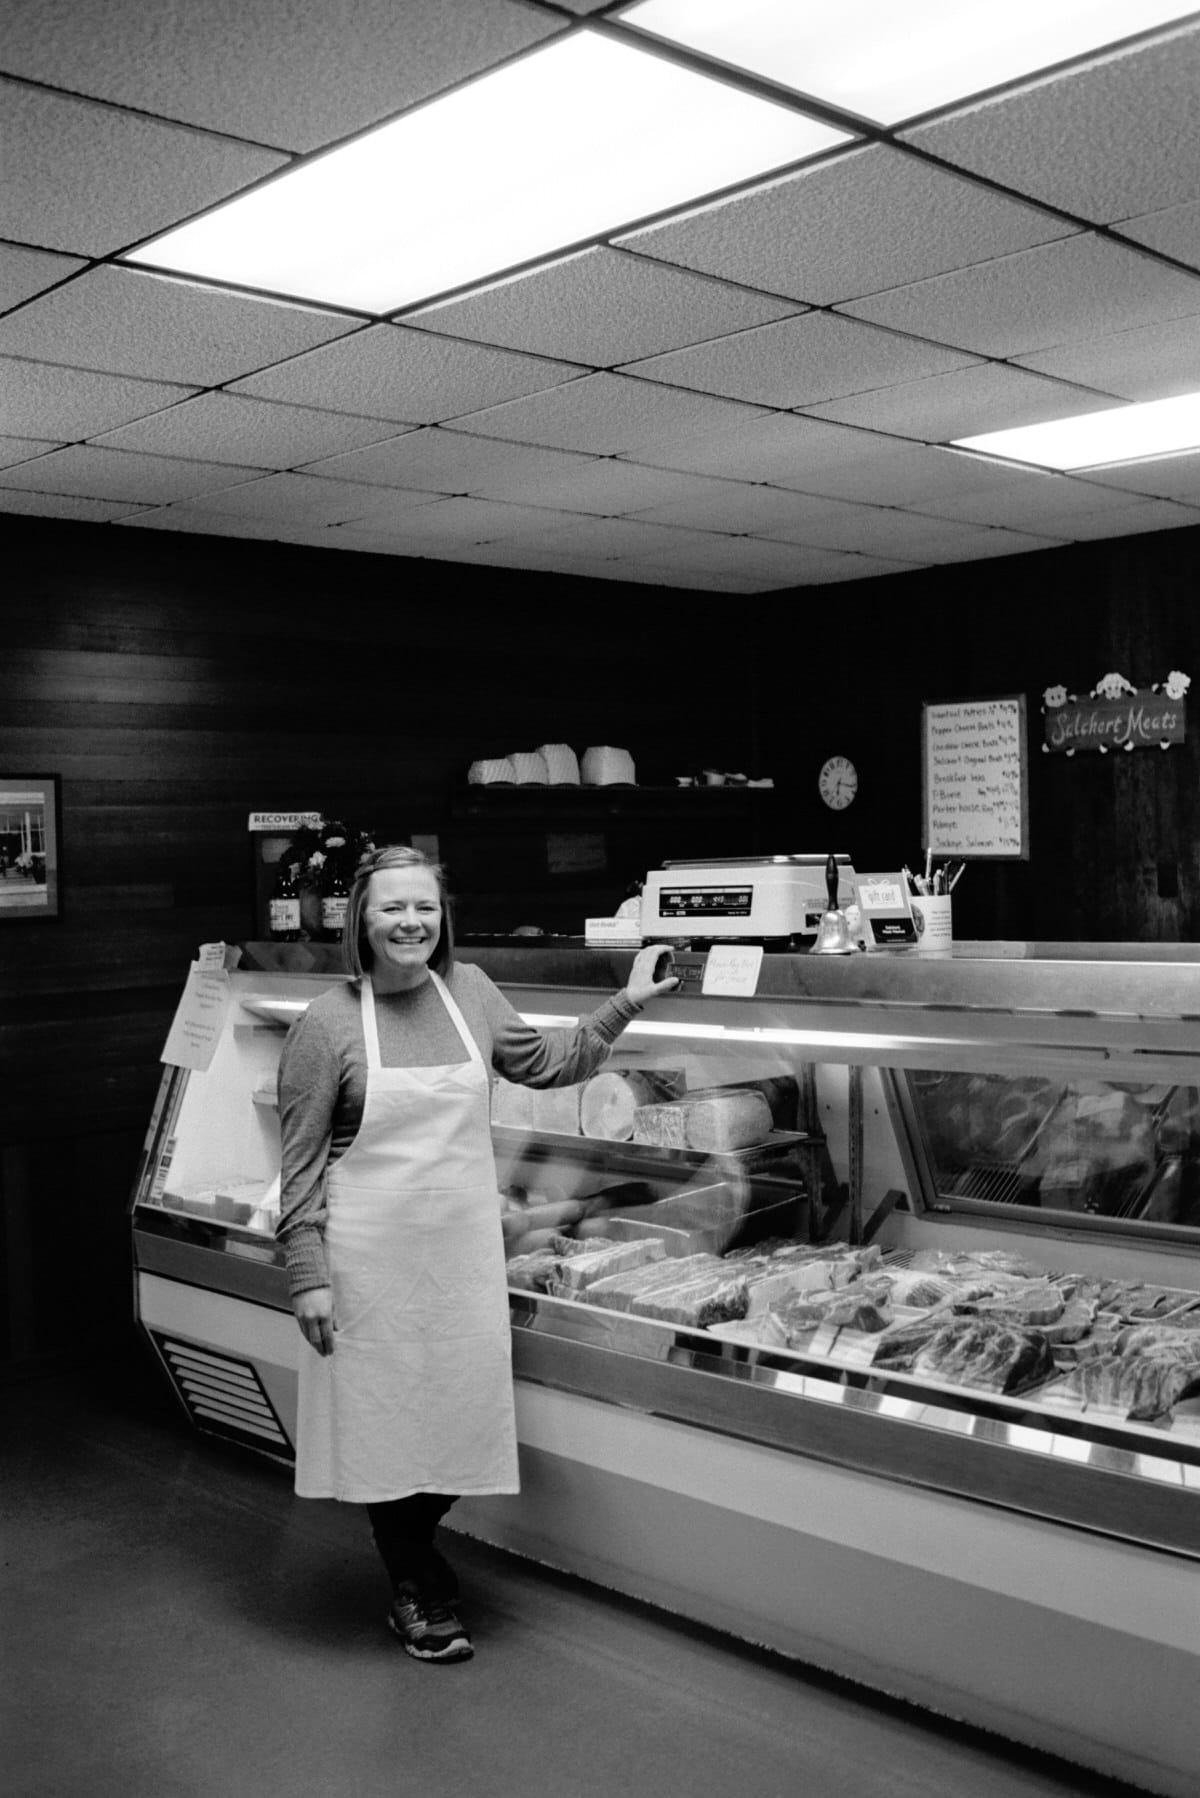 Illuminating-women_exhibition-black-and-white-fine-art-film-photography-of-Katie-Fuhrmann-of-Salchert-Meats-by-Studio-L-photographer-Laura-Schneider-_019